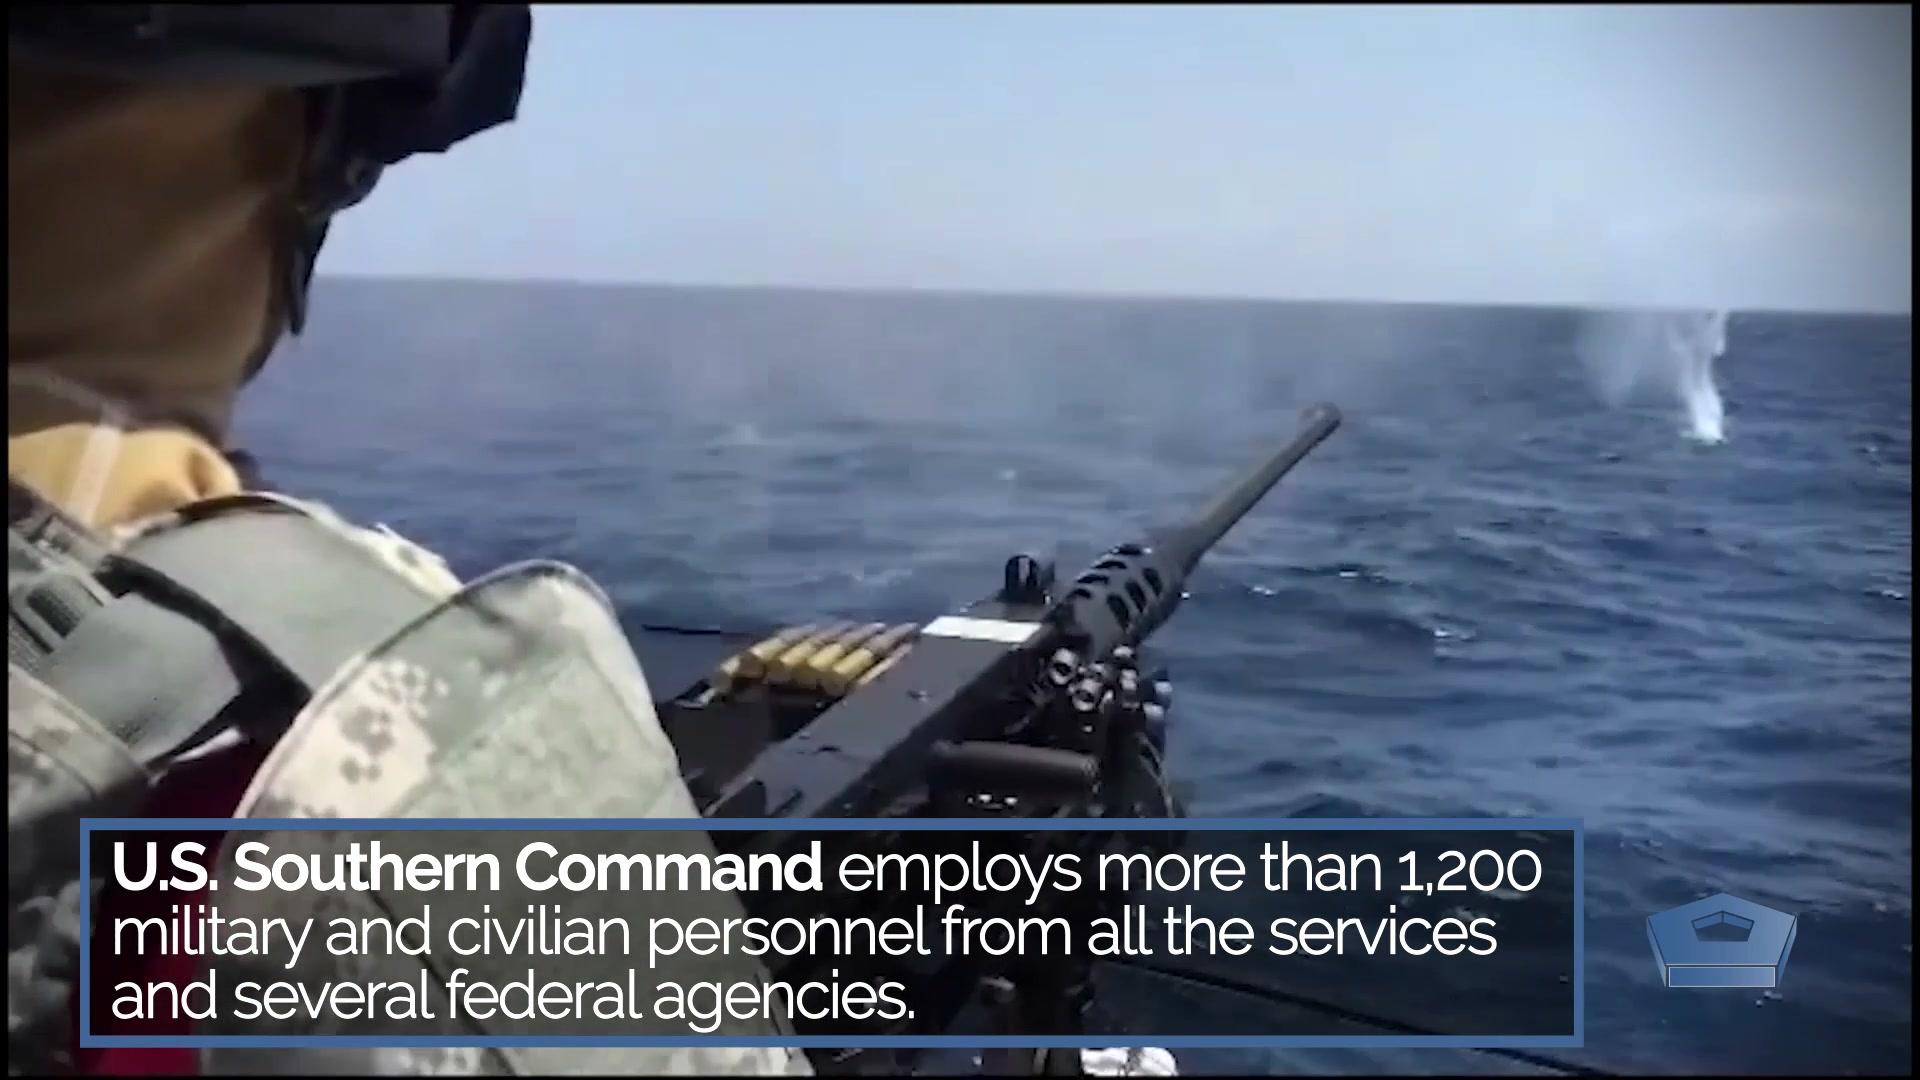 A service member fires rounds from a machine gun toward the ocean.